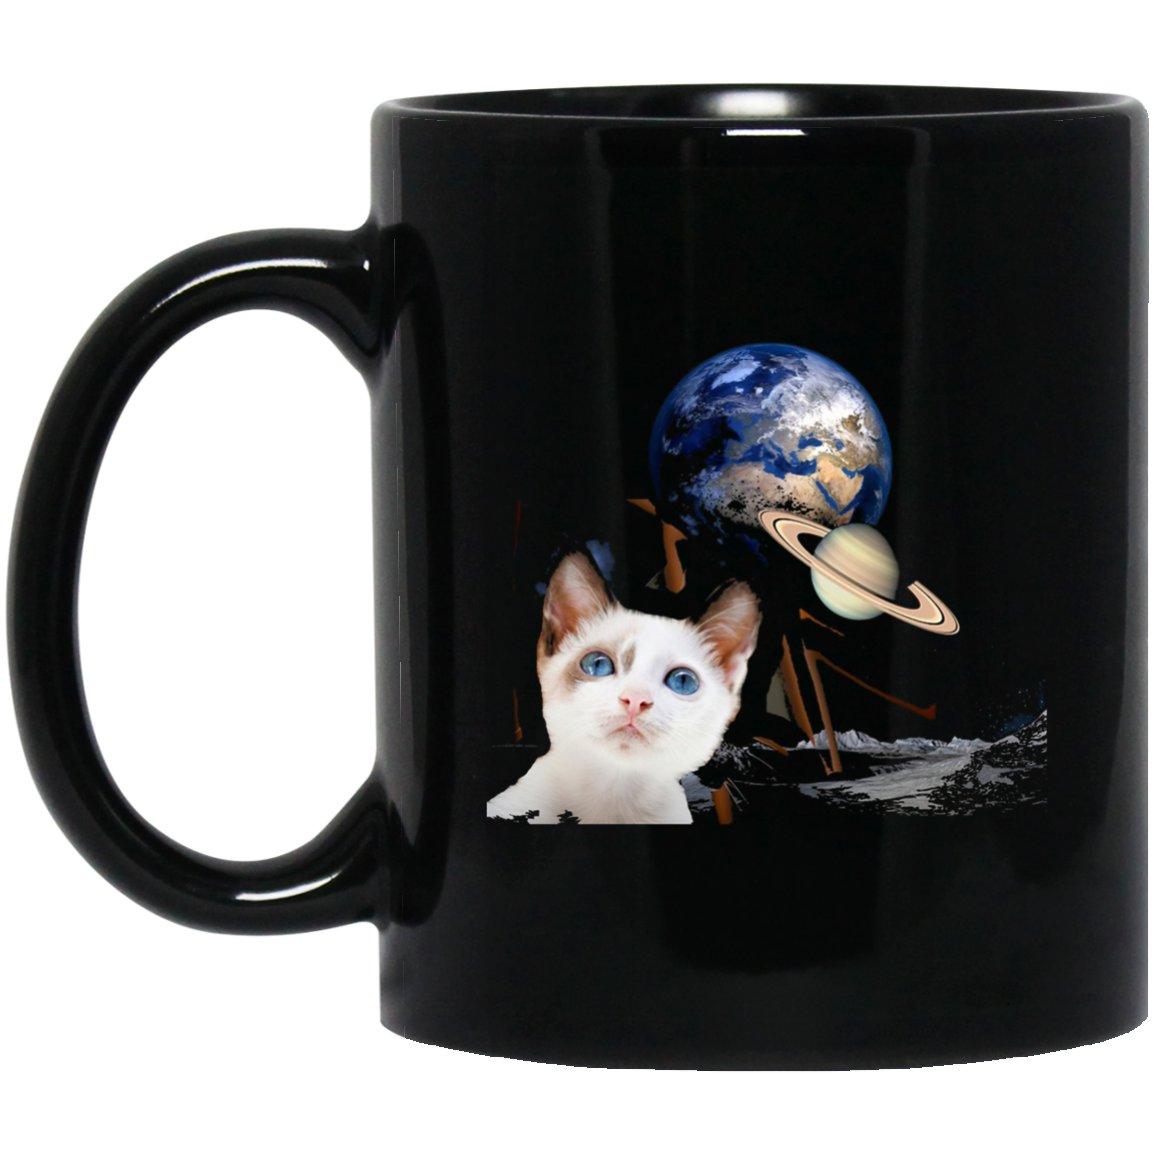 Cute Kitten Earth Planets Outer Space Black  Mug Black Ceramic 11oz Coffee Tea Cup